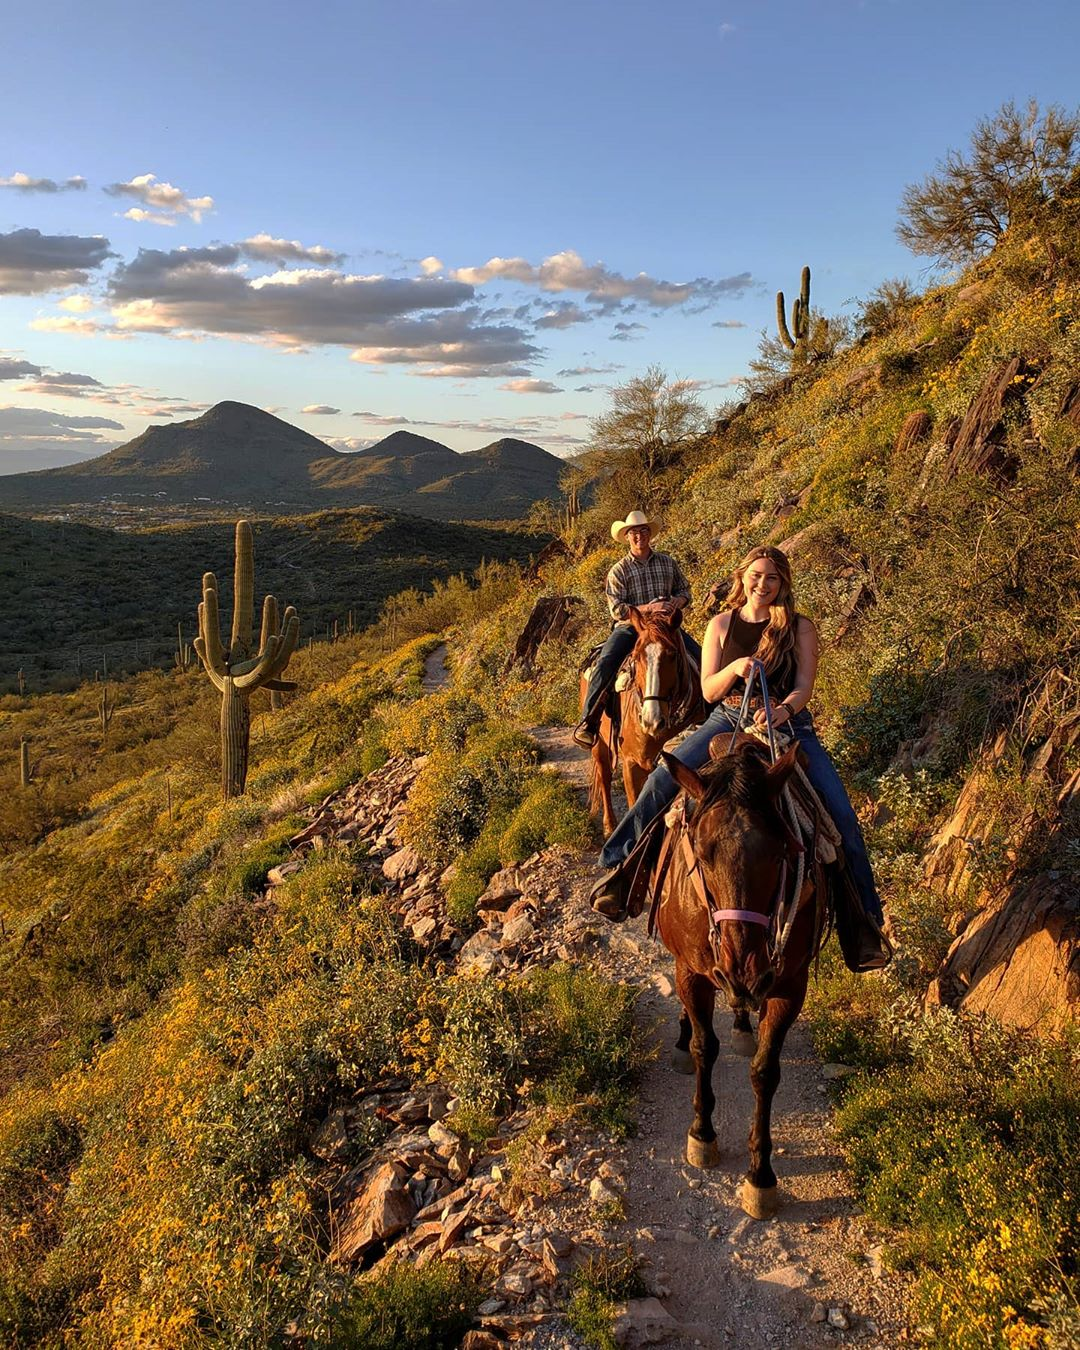 Sunset Ride horseback ride in phoenix